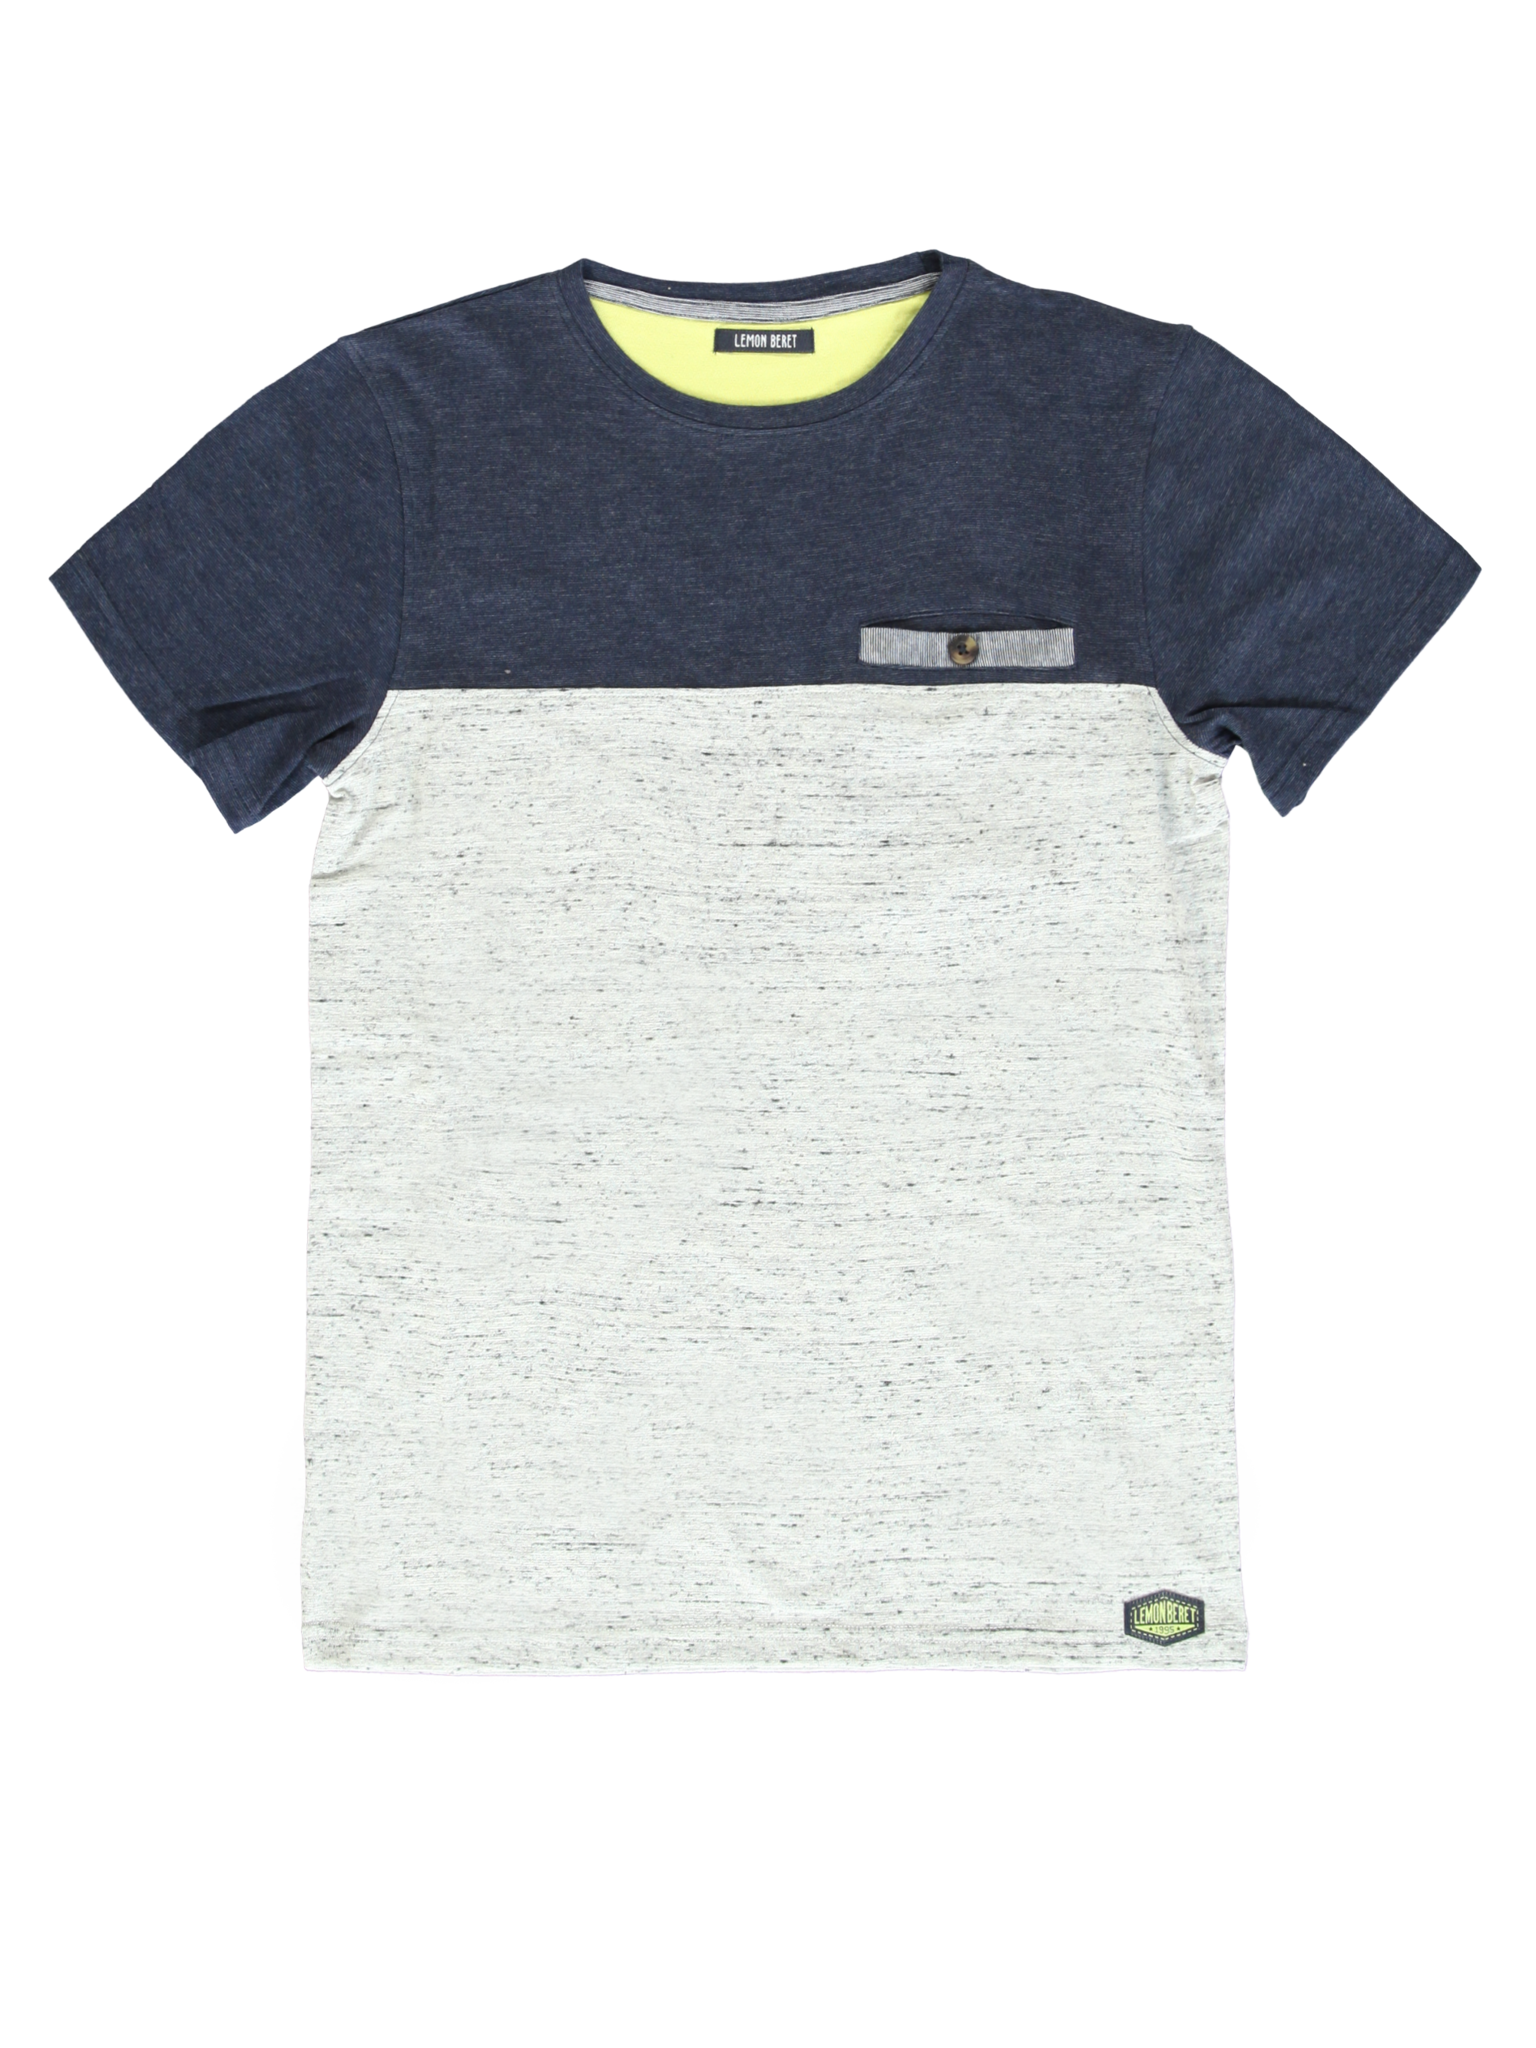 All Brands | Summerproducts Teen Boys | T-shirt | 12 pcs/box